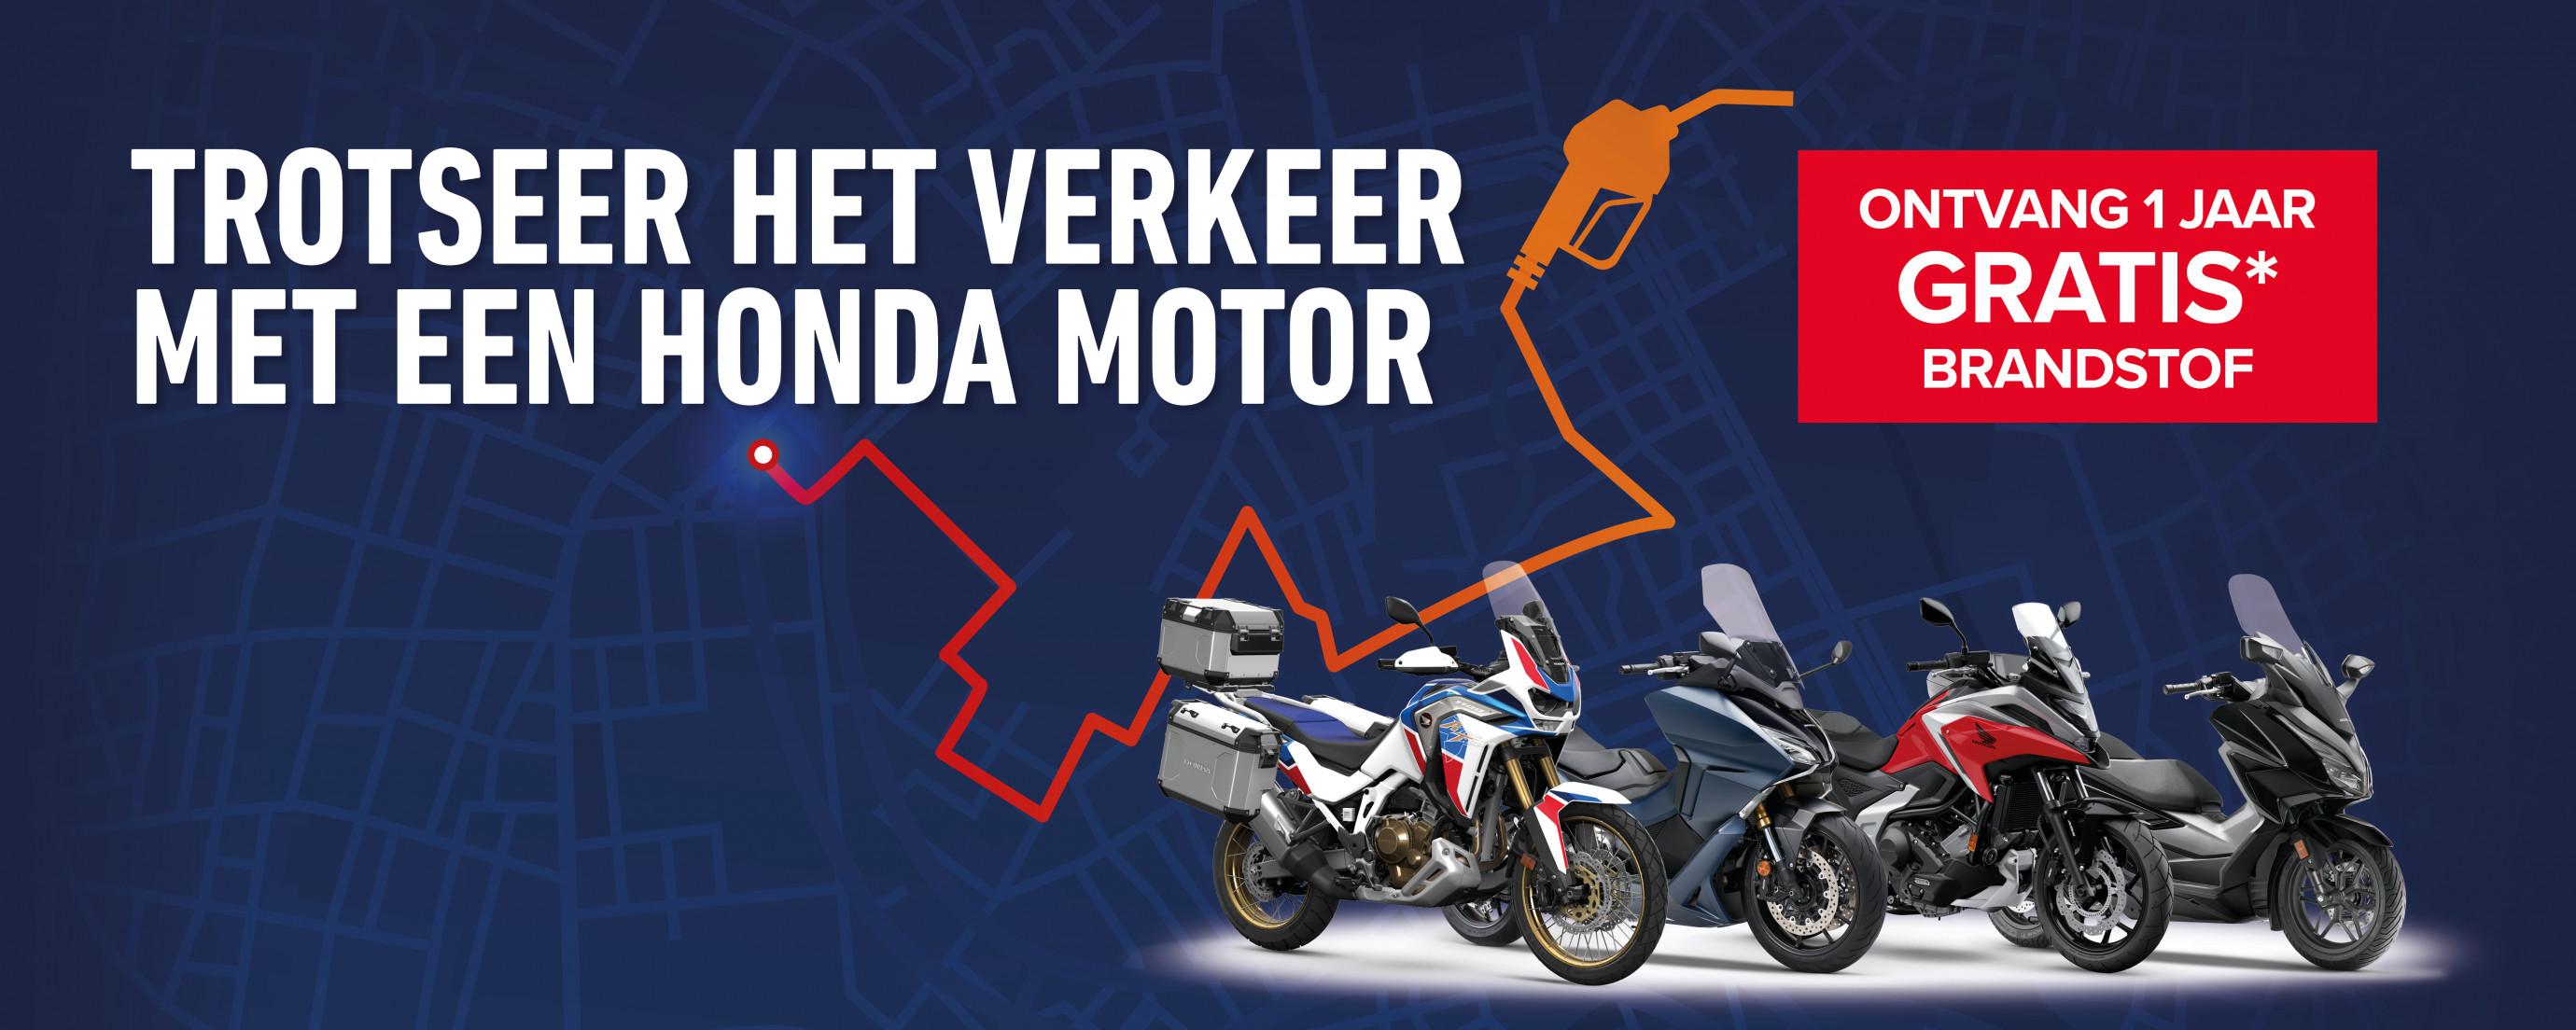 HondaMobility21_3000x1200[1][2]